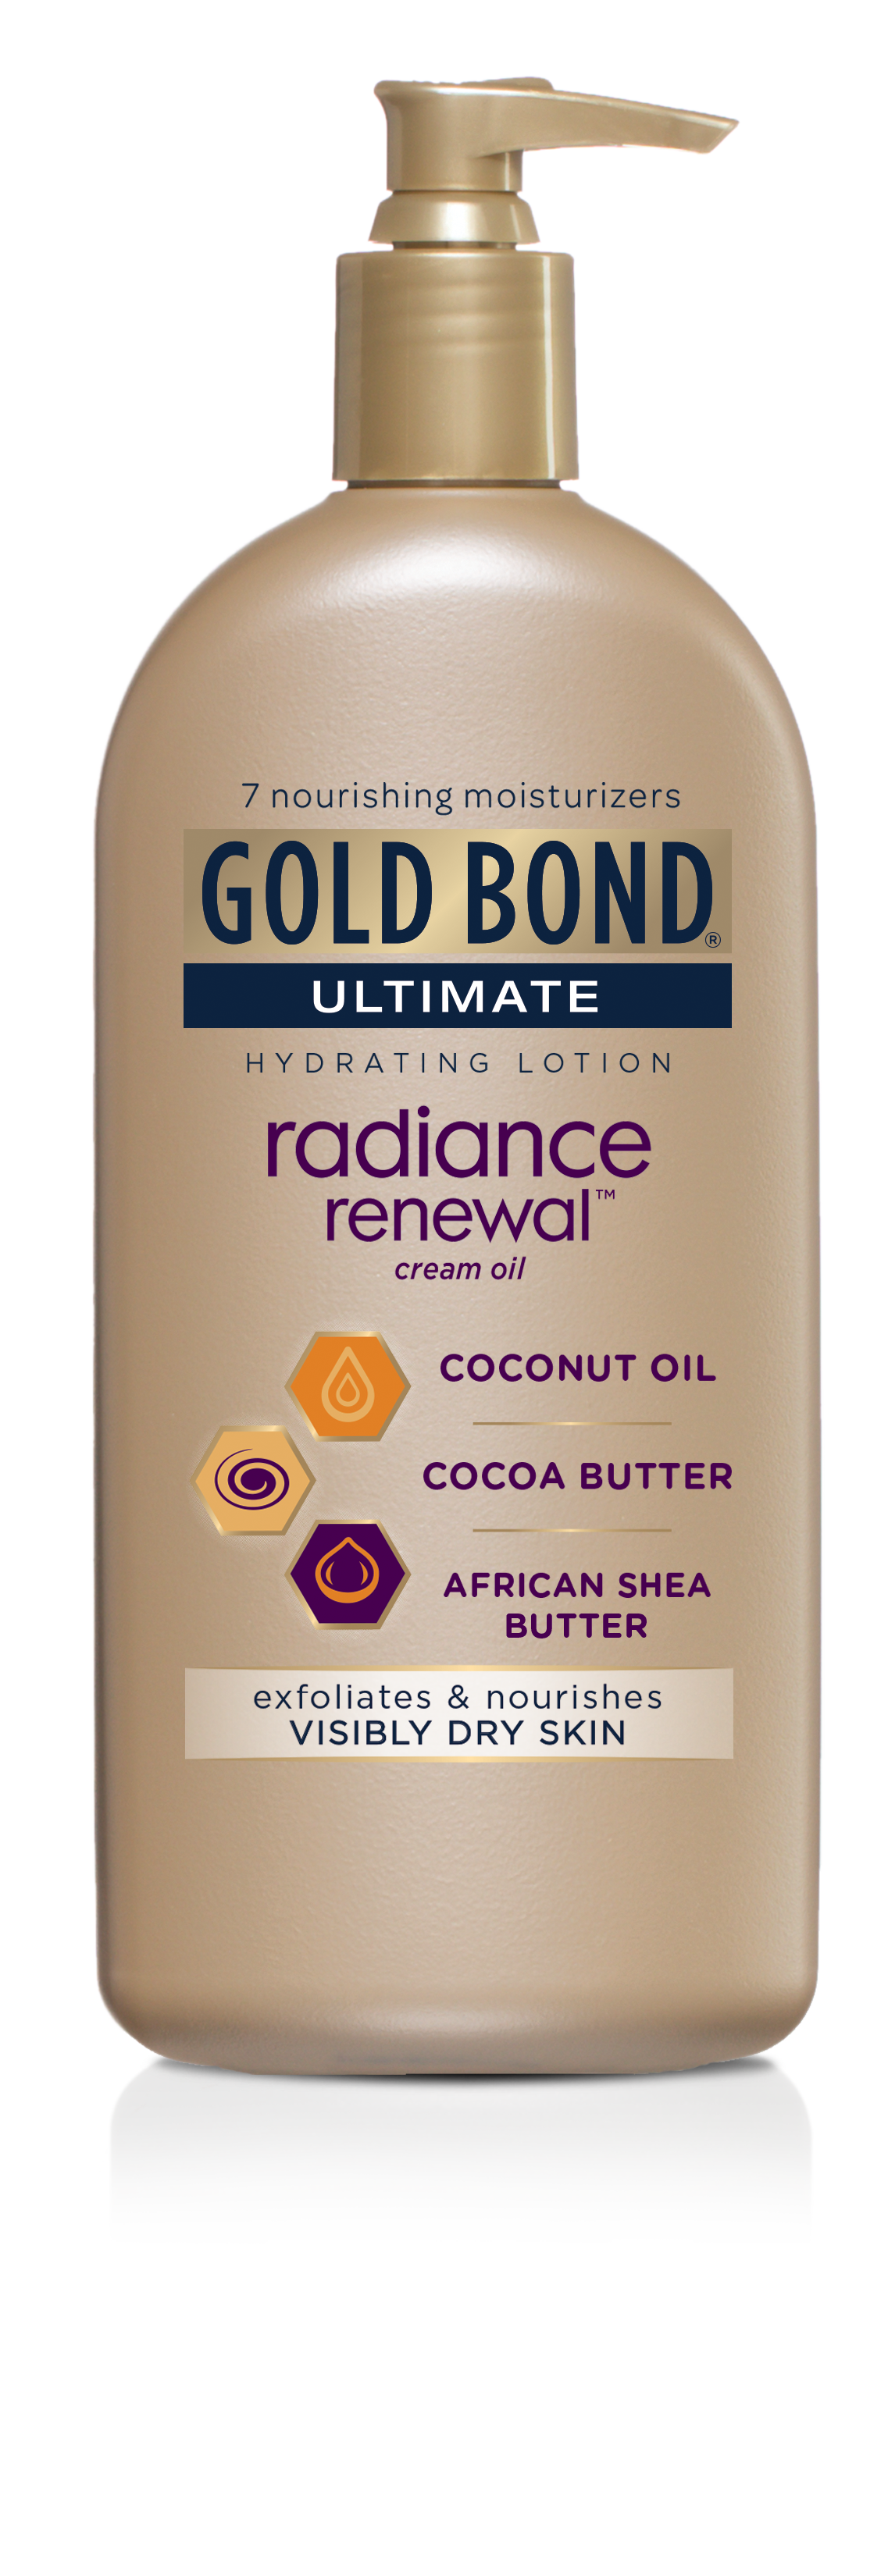 Gold Bond Ultimate Radiance Renewal Lotion